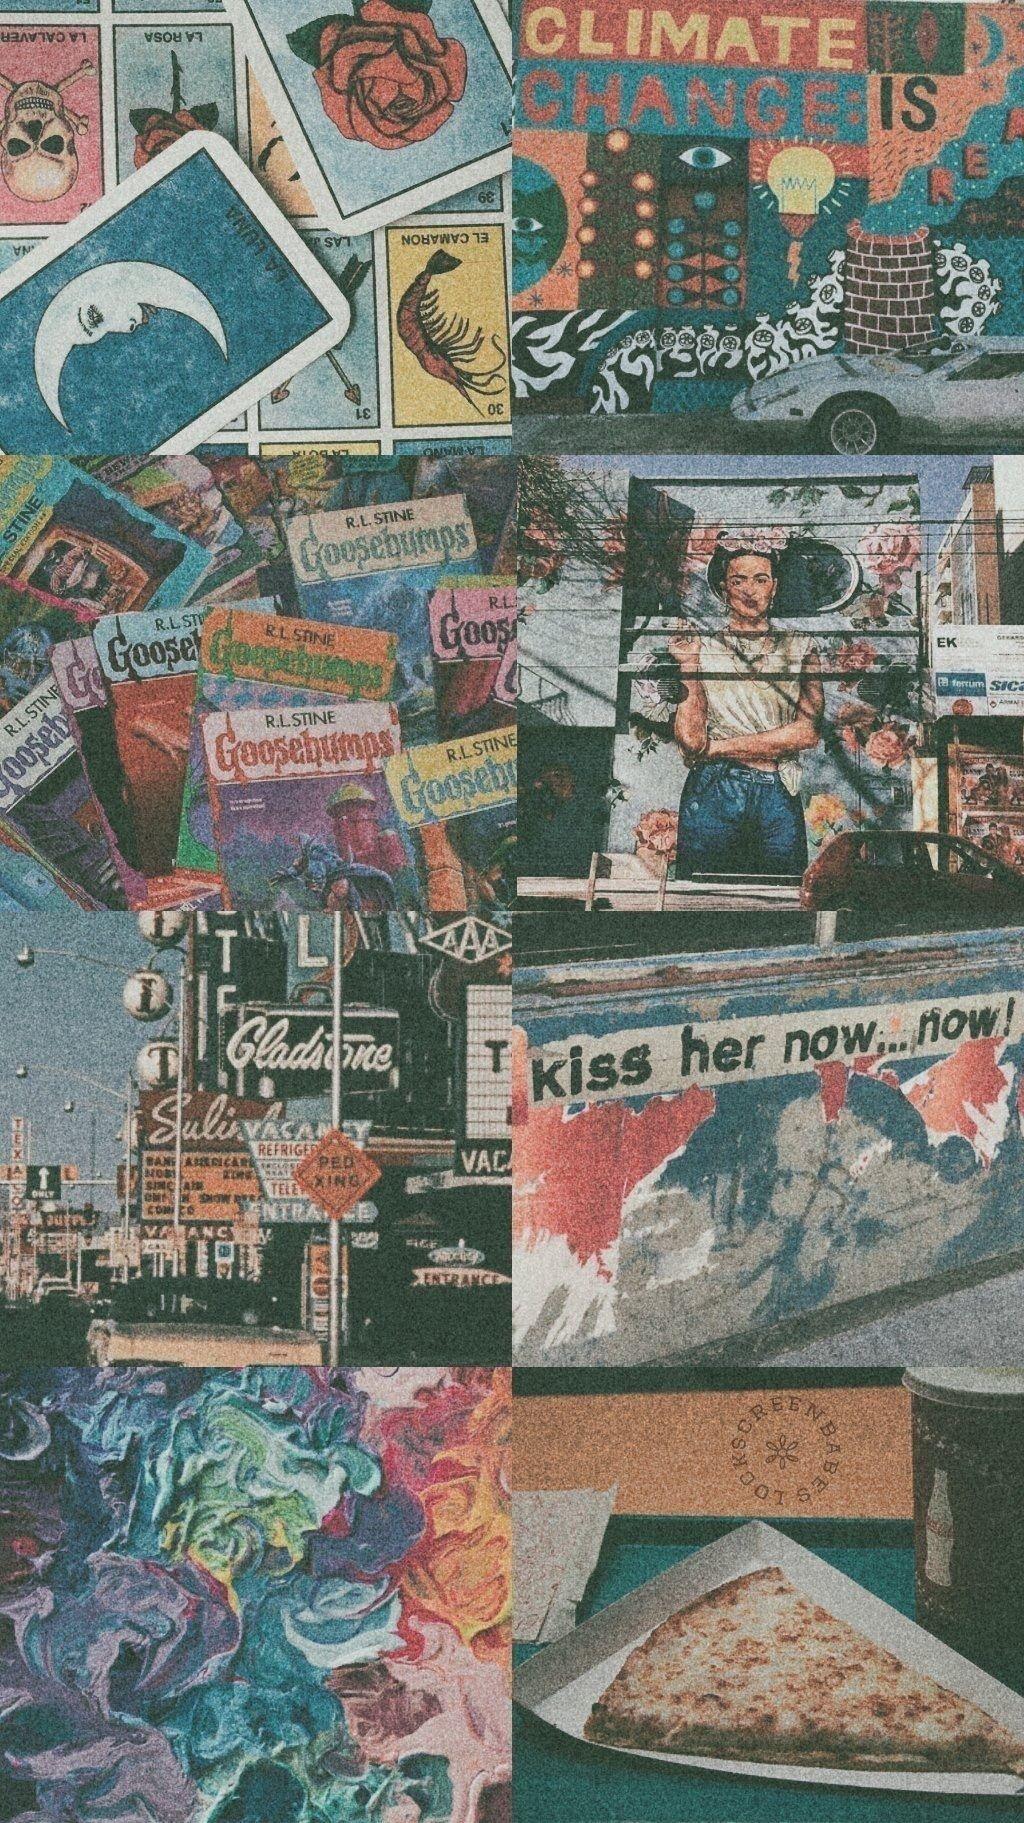 Fresh 90s Aesthetic Wallpaper Iphone Vintage In 2020 Iphone Wallpaper Vintage Art Wallpaper Aesthetic Wallpapers